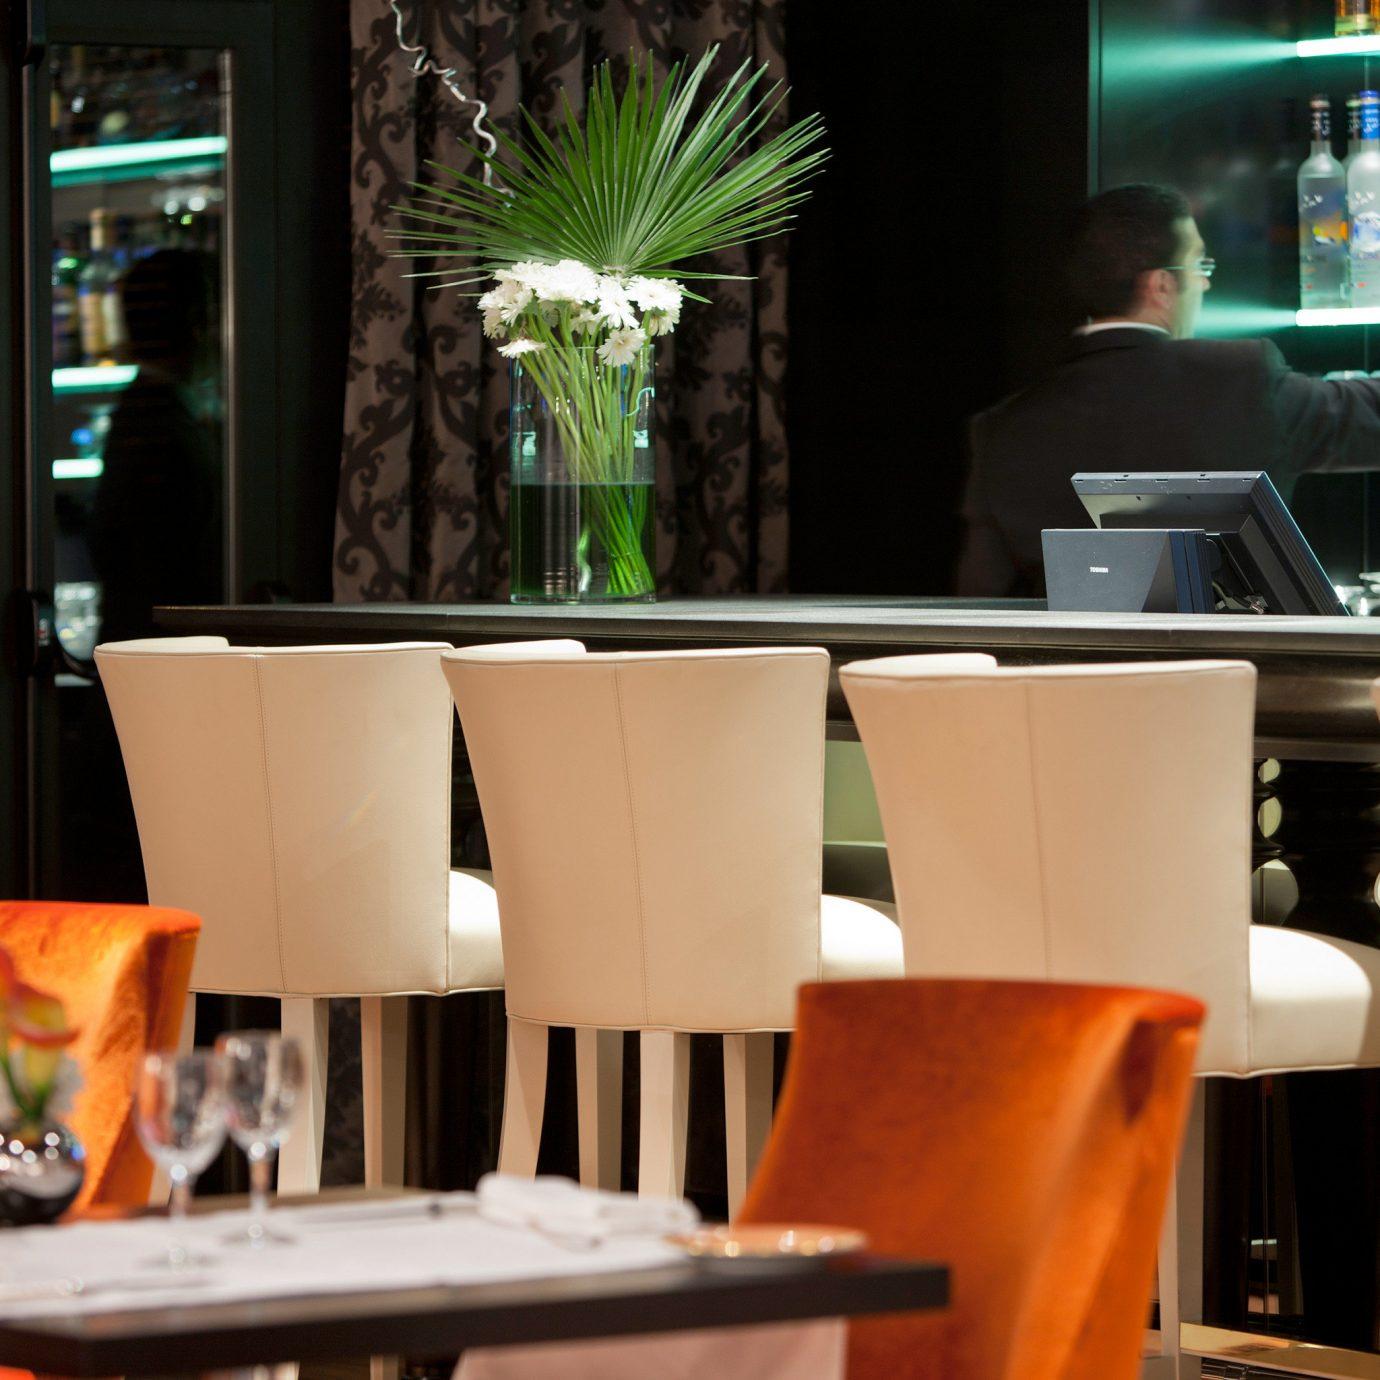 Bar Drink Modern Resort restaurant home Dining café coffeehouse dining table